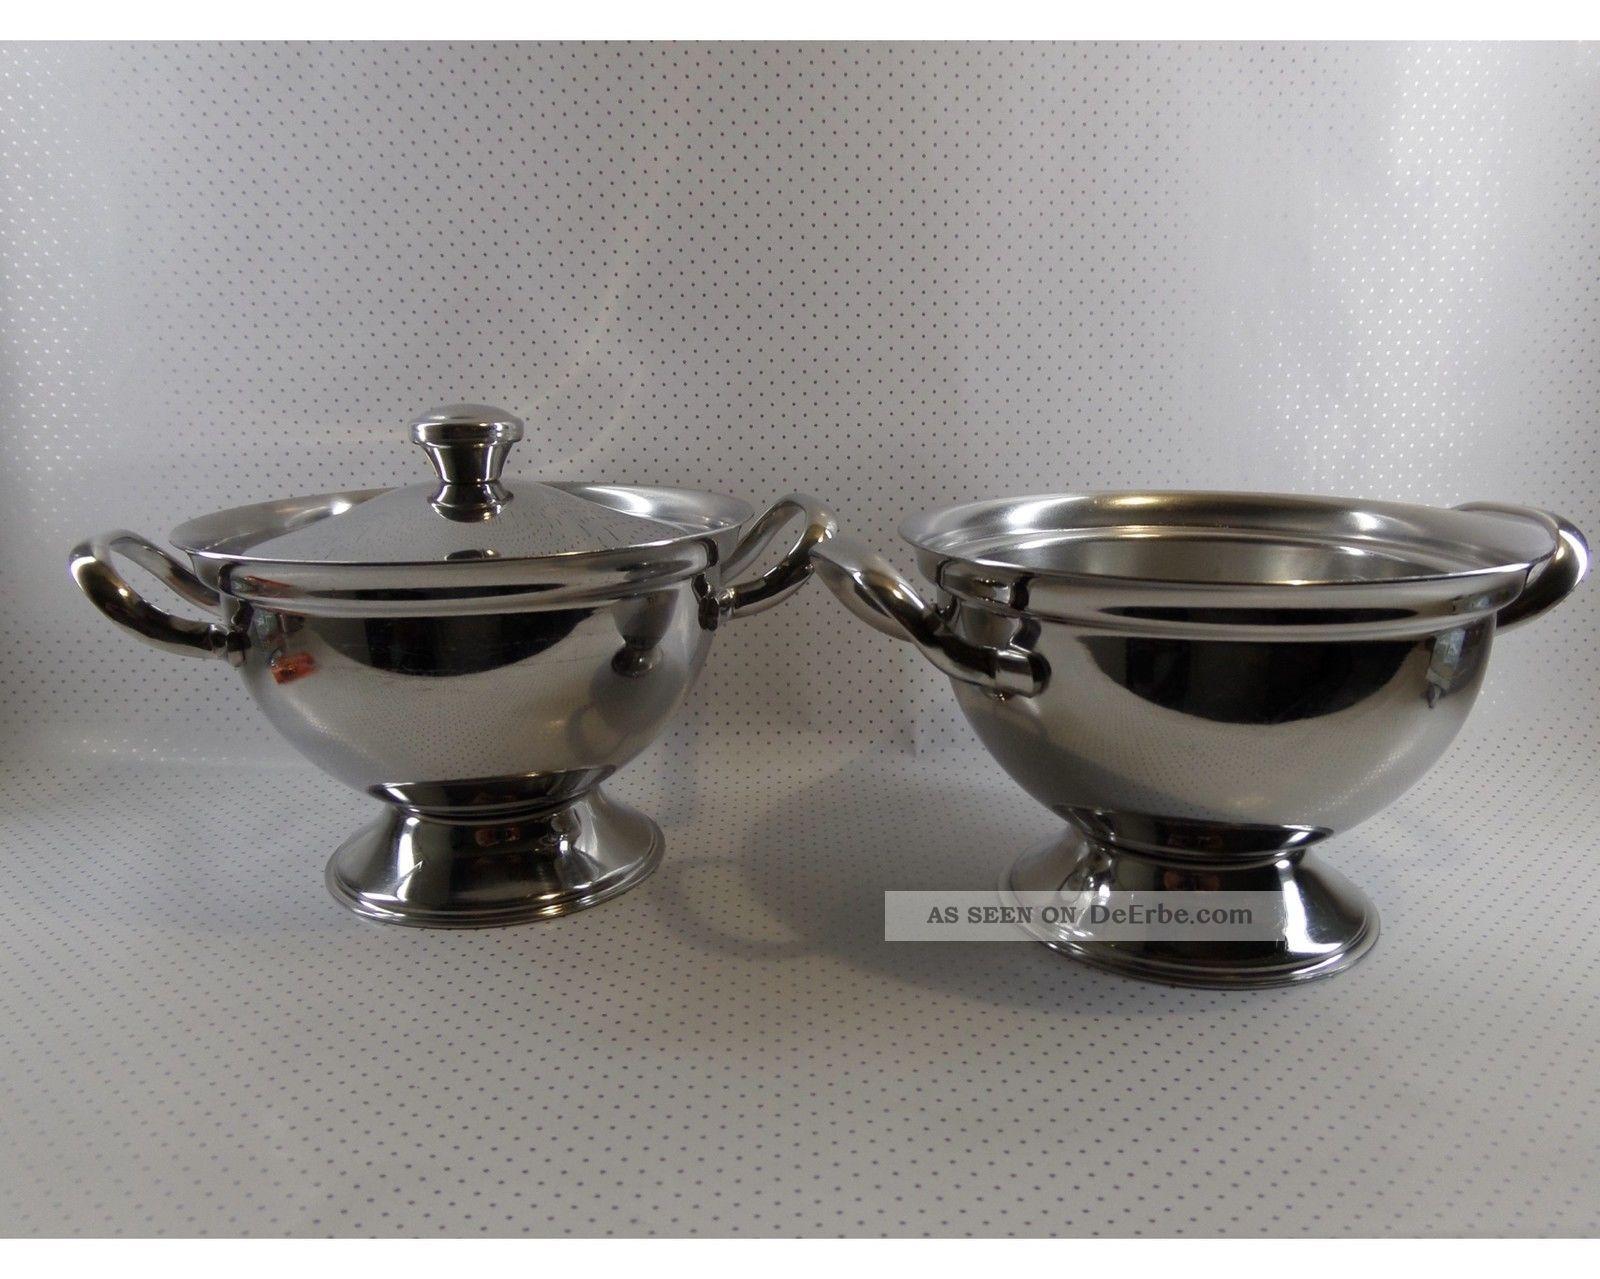 Zwei Alessi Saucieren Echte Designklassiker Top Erhalten Design 1964 Sehr Selten 1960-1969 Bild